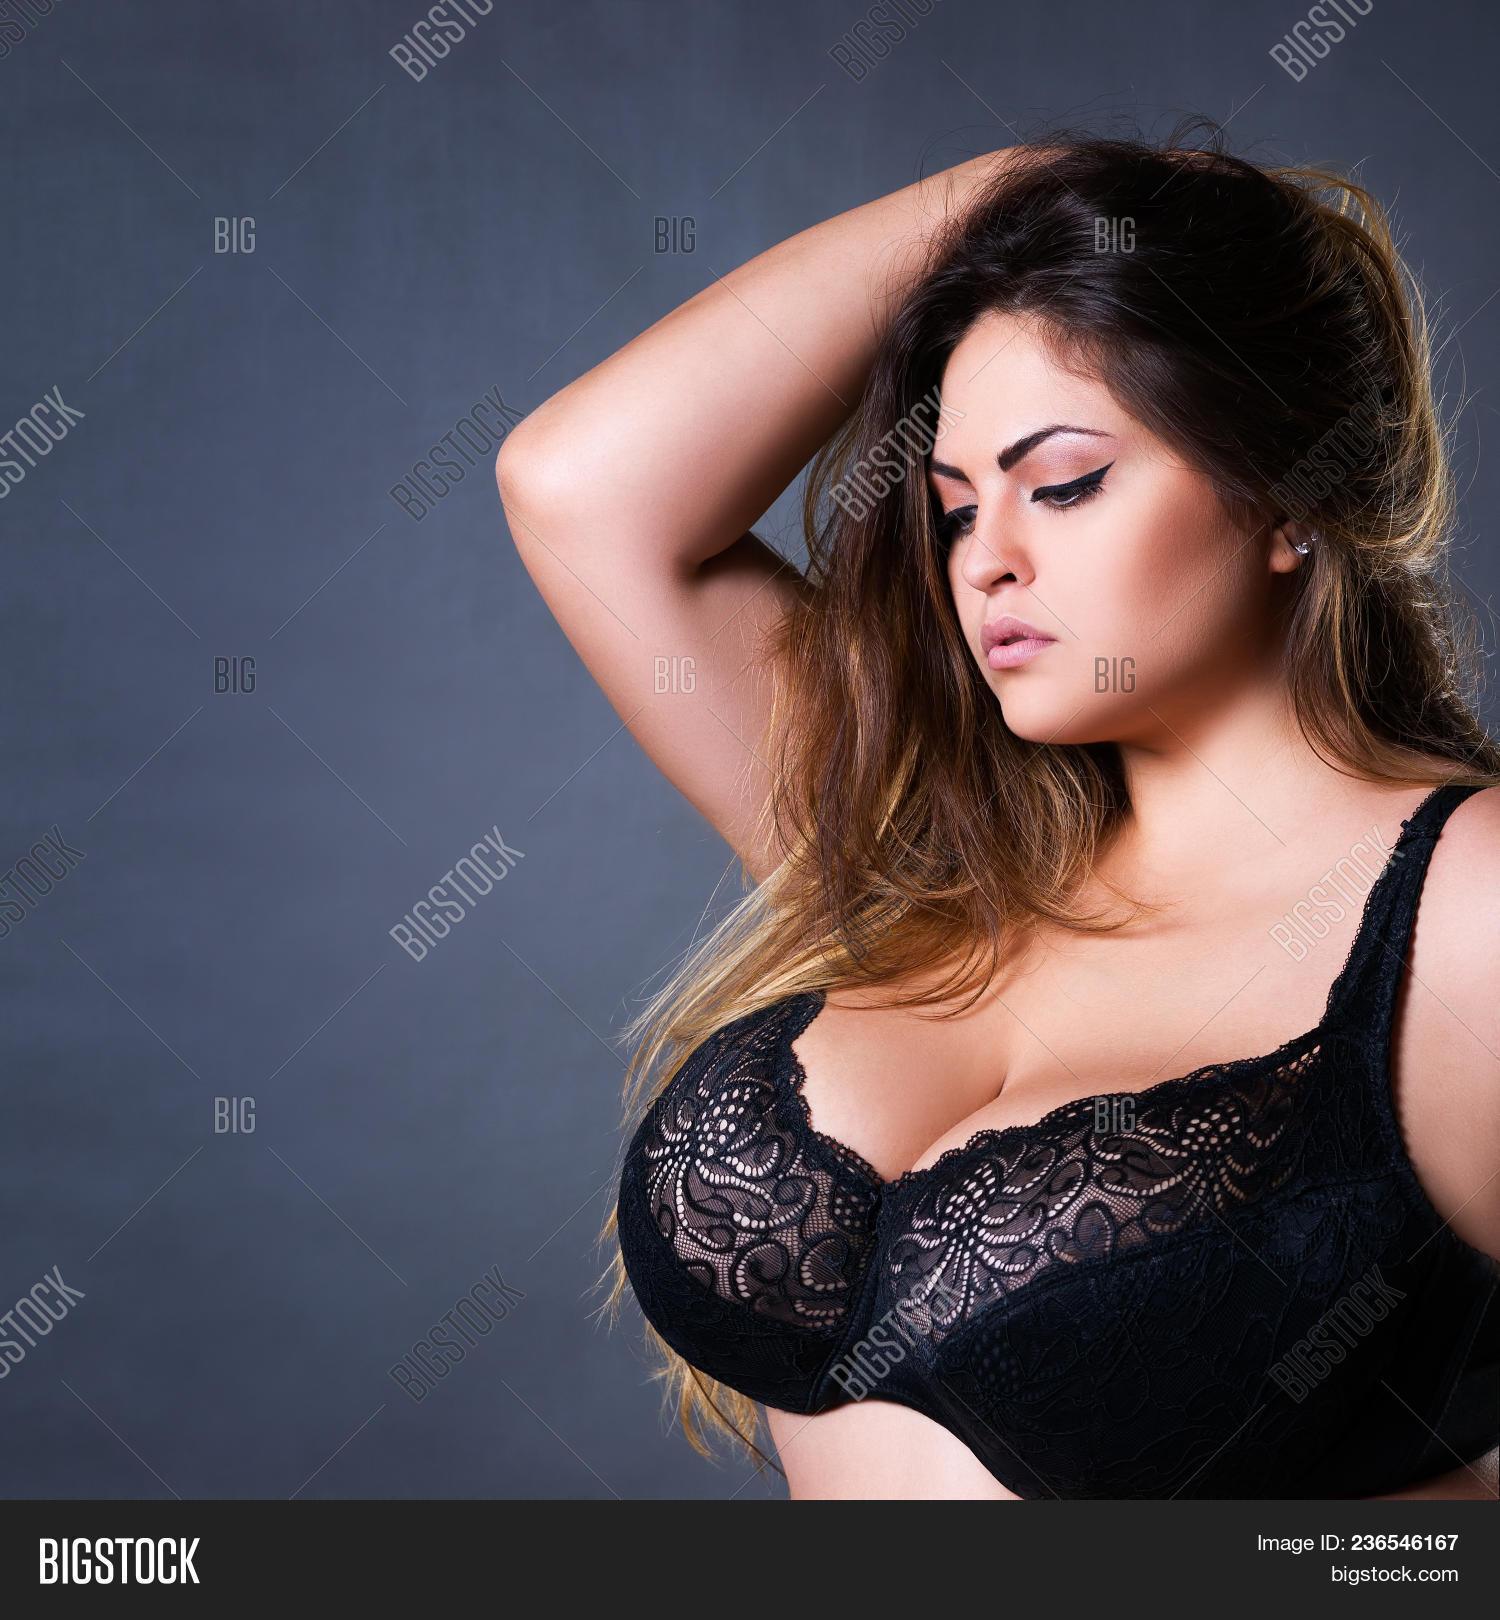 Ordinary girl posing nude